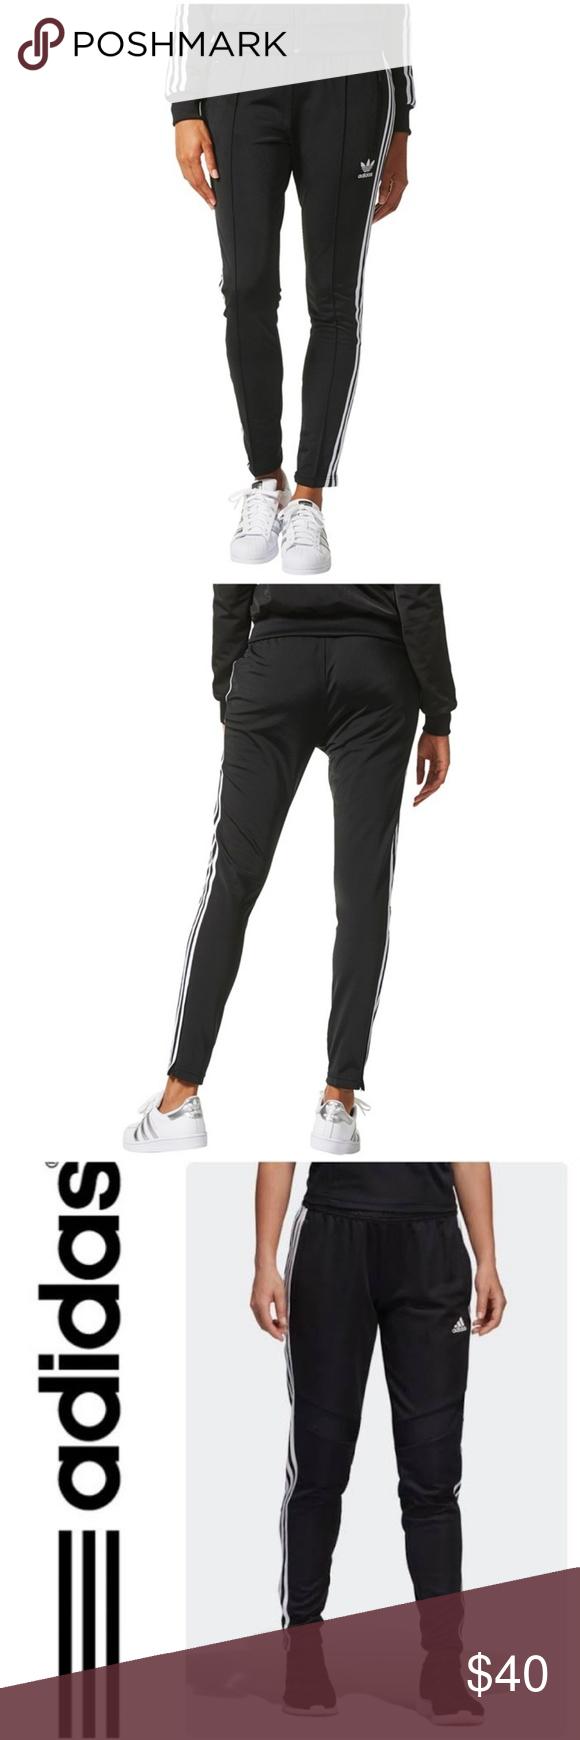 pantaloni adidas s